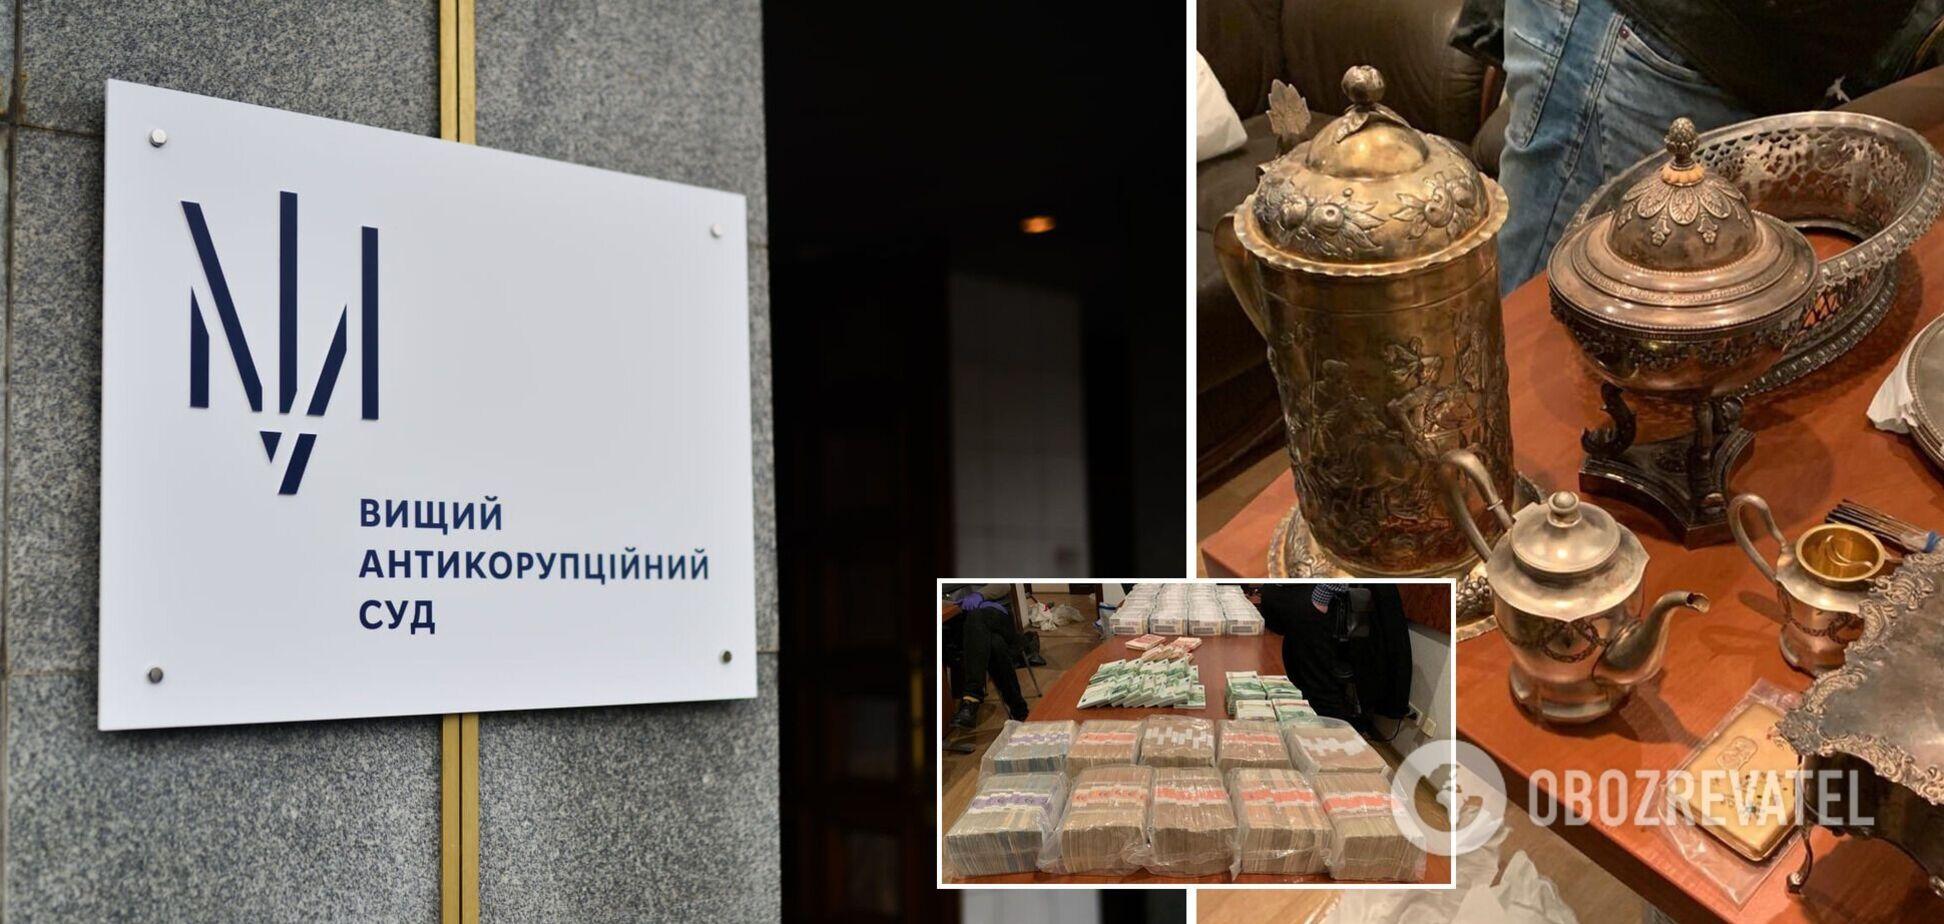 Соучастника по делу брата Вовка арестовали с залогом почти в 3 млн